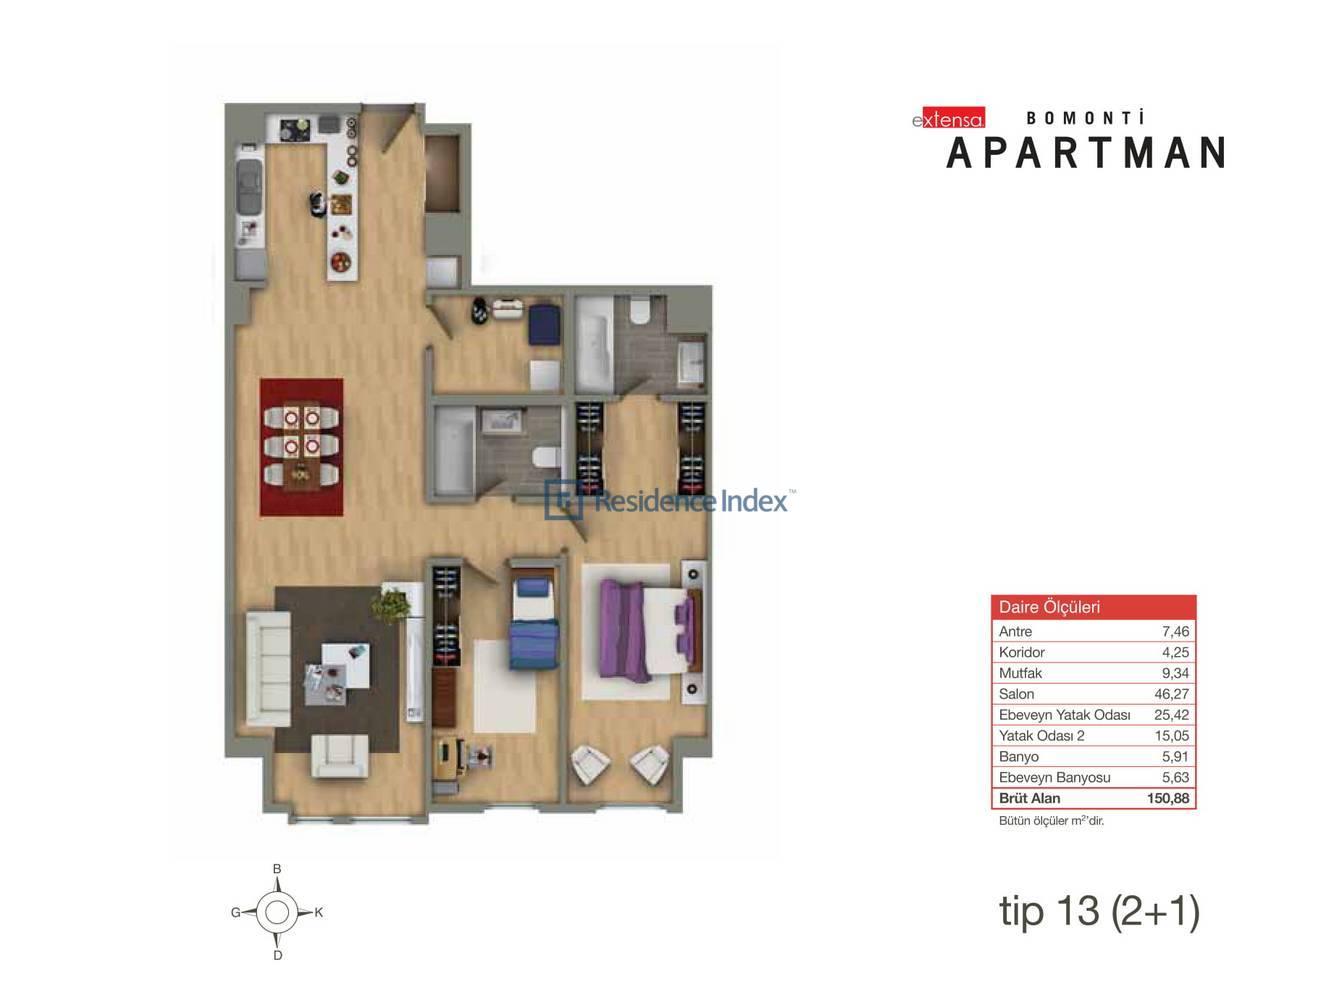 Bomonti Apartmanı Tip 13